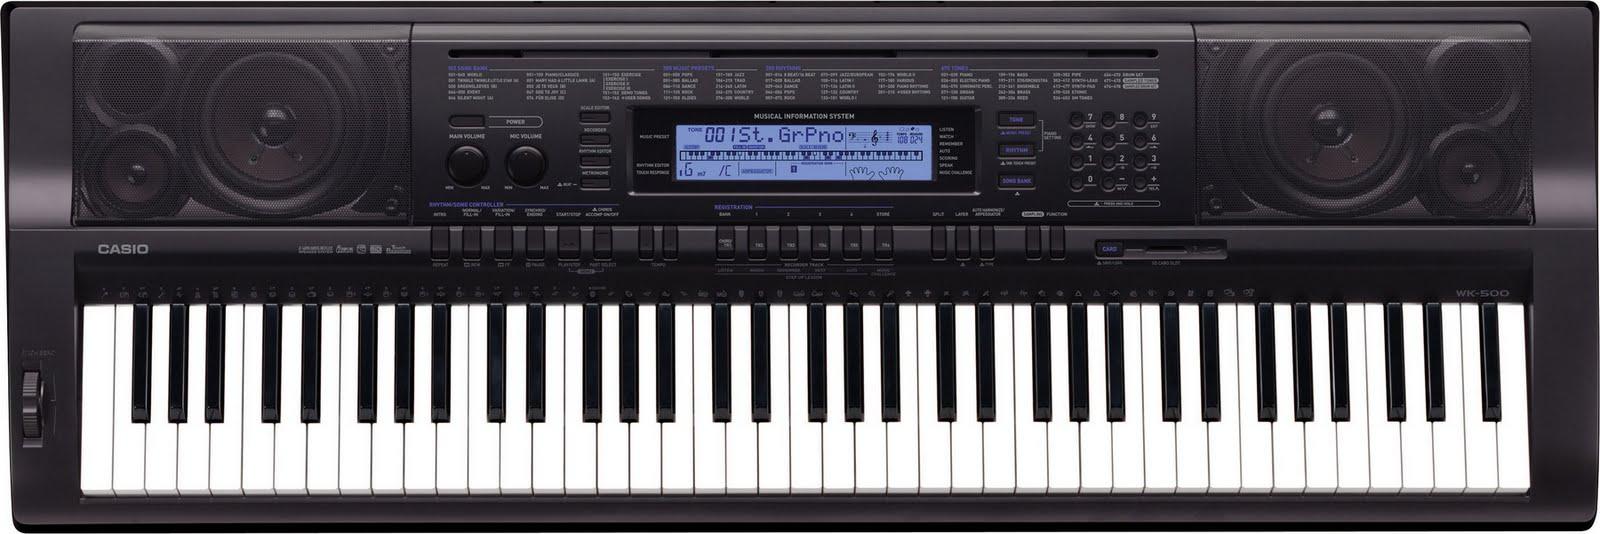 Digital Piano Or Keyboard : digital keyboard vs digital piano review ~ Hamham.info Haus und Dekorationen